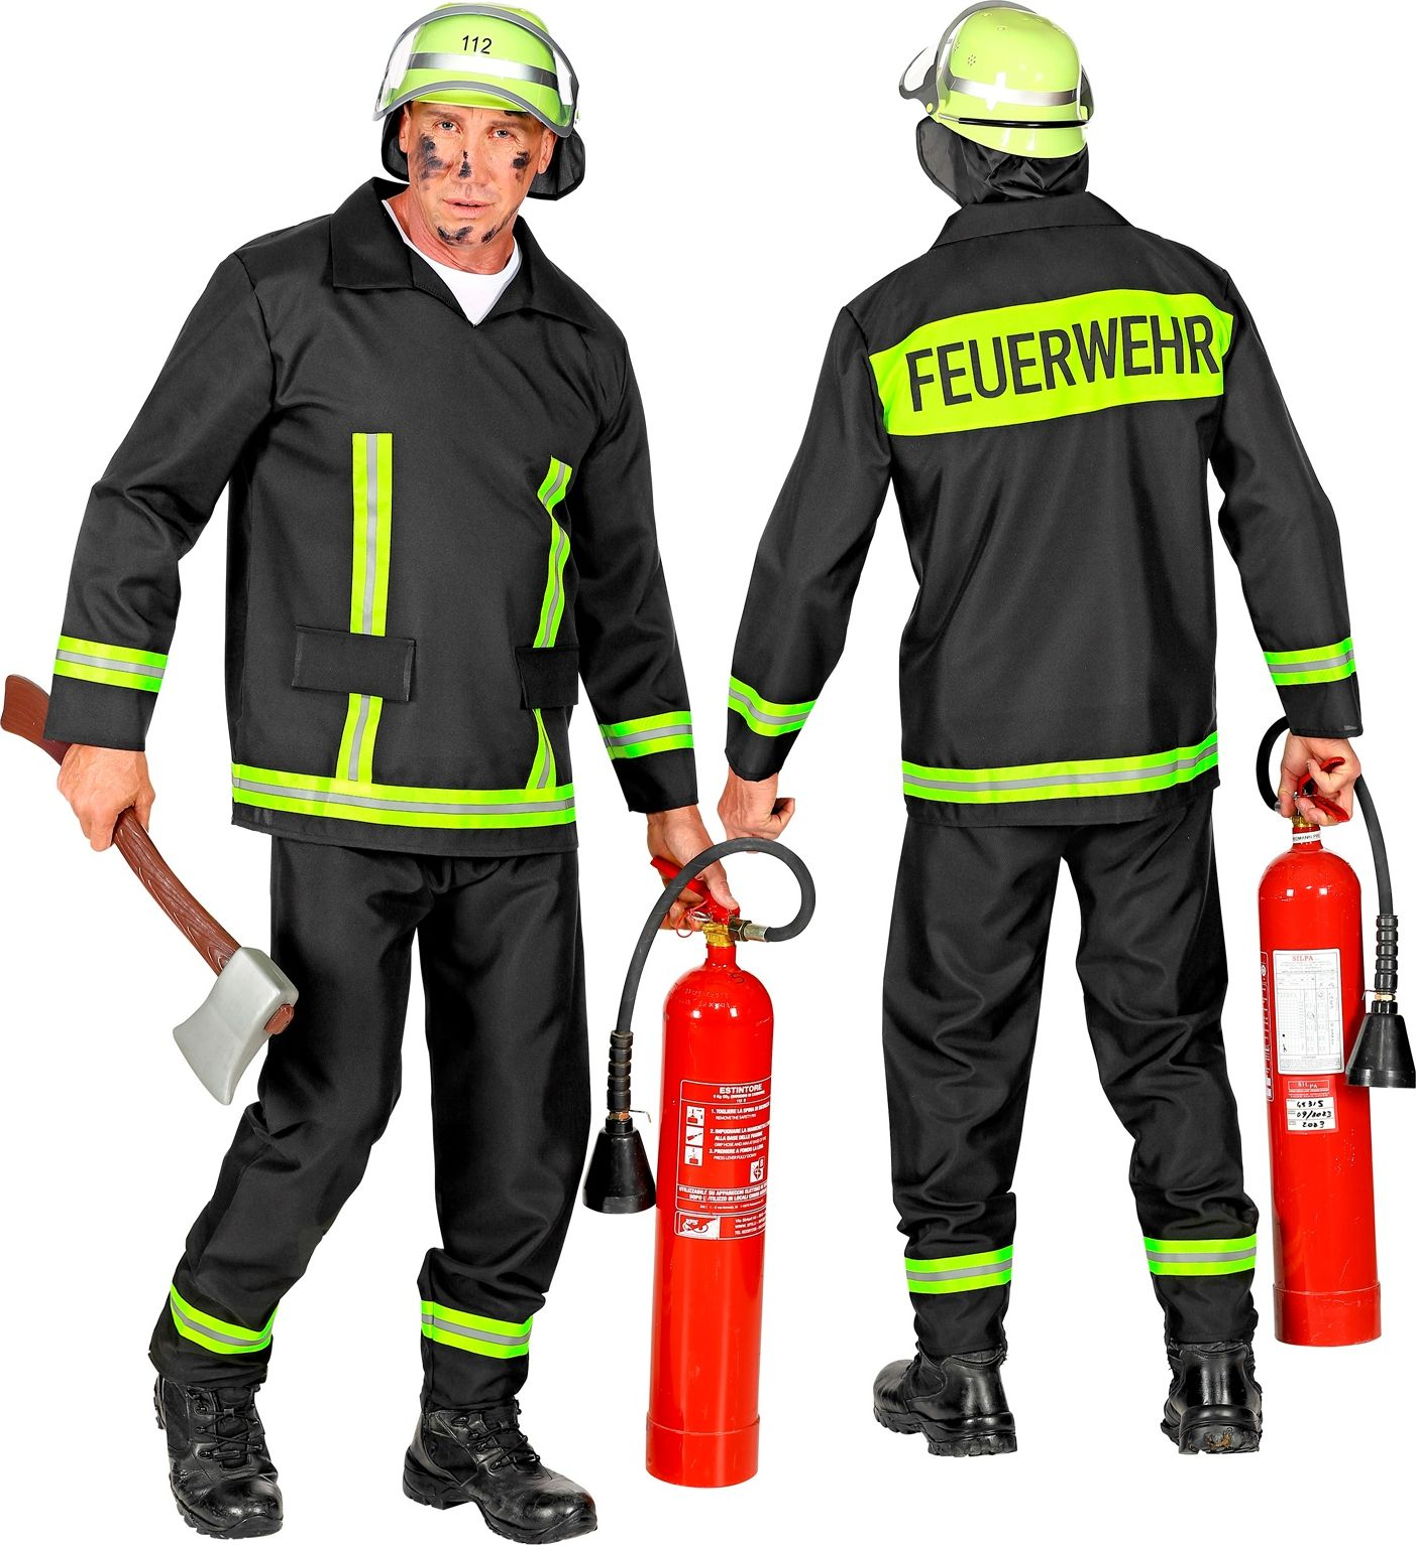 Brandweer kostuum mannen